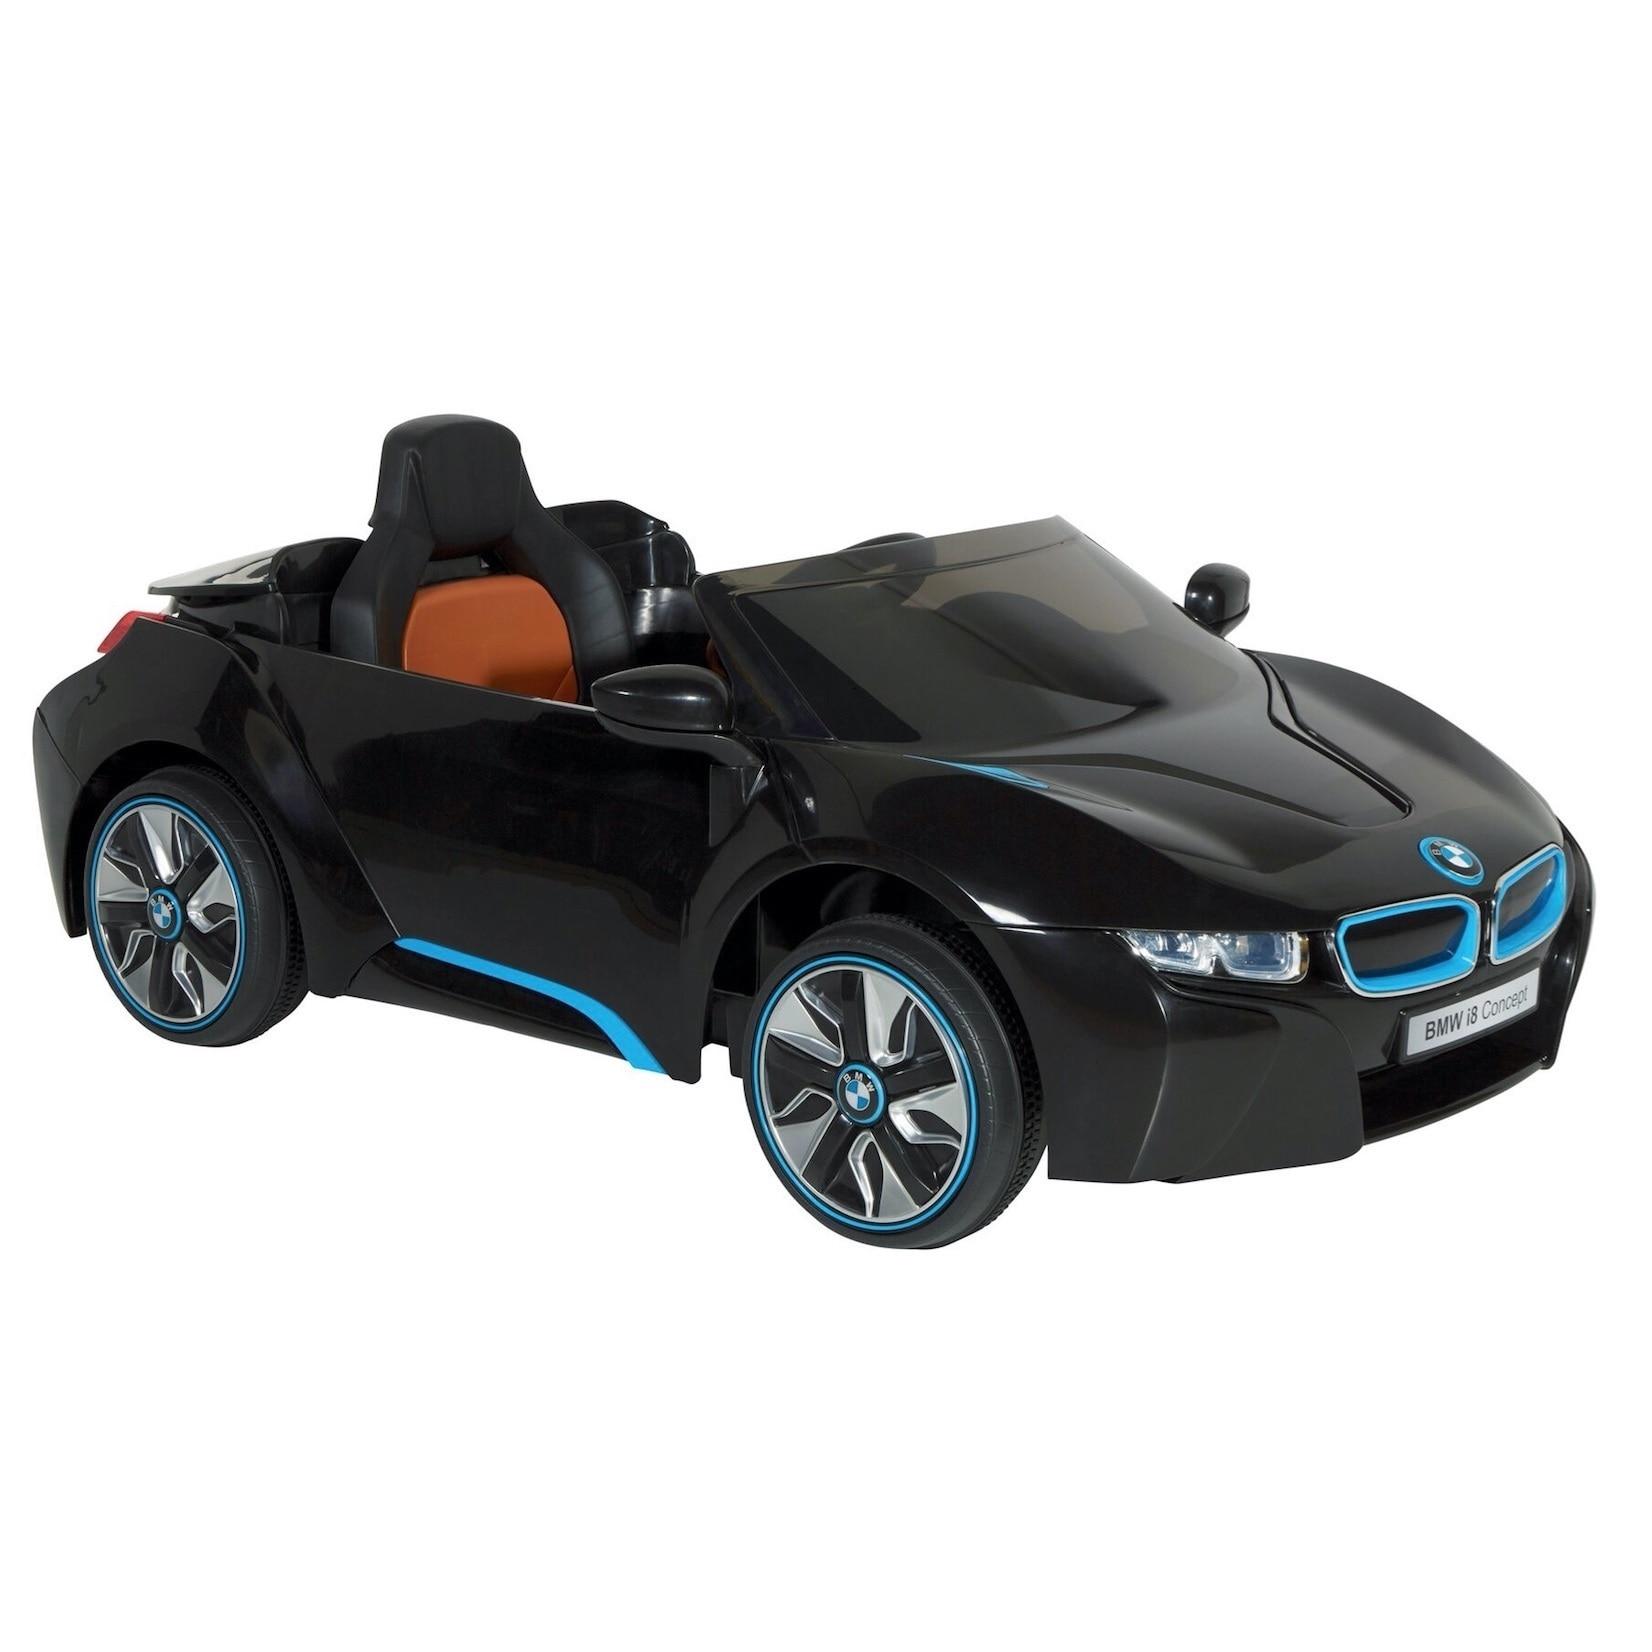 Dynacraft Bmw I8 Concept 6 Volt Electric Ride On Car Black